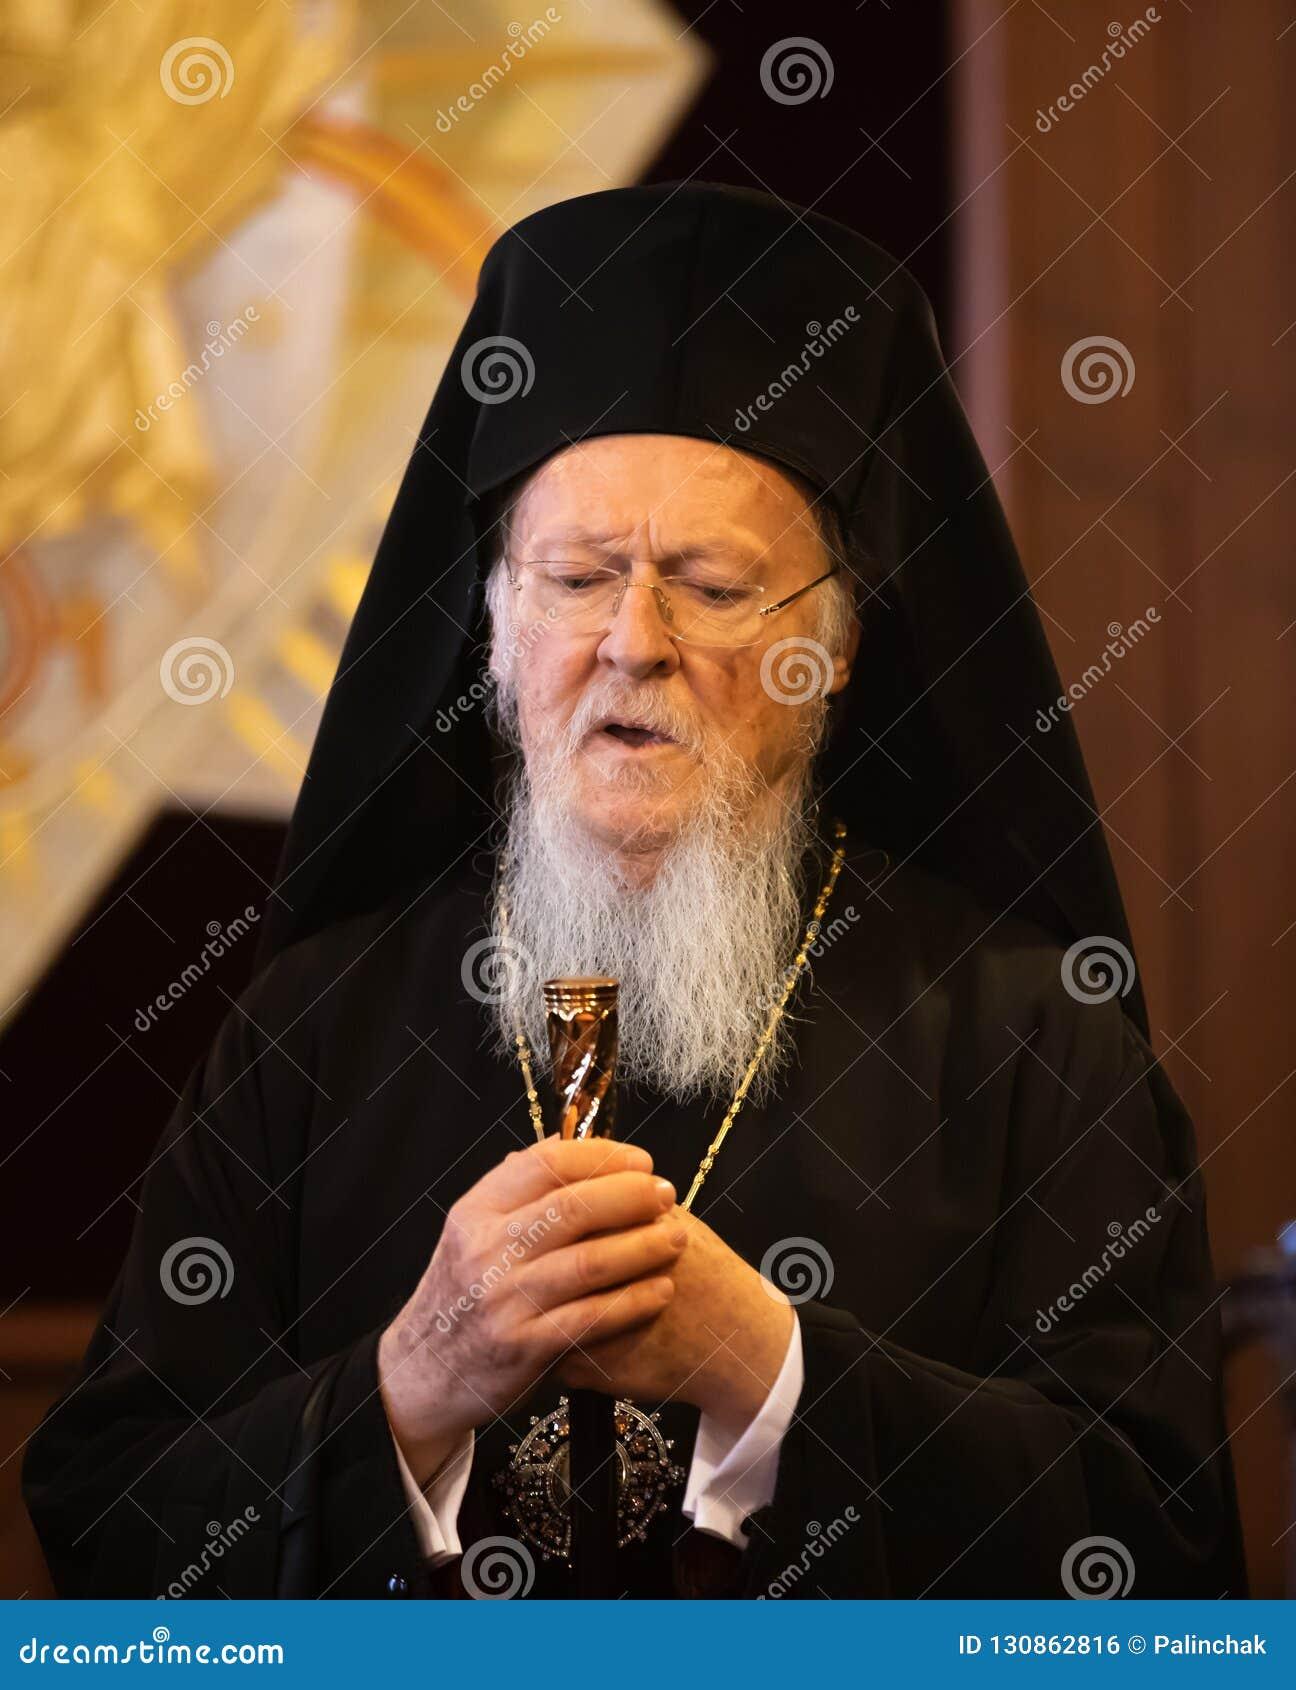 Hans All-helighet ekumeniska patriark Bartholomew